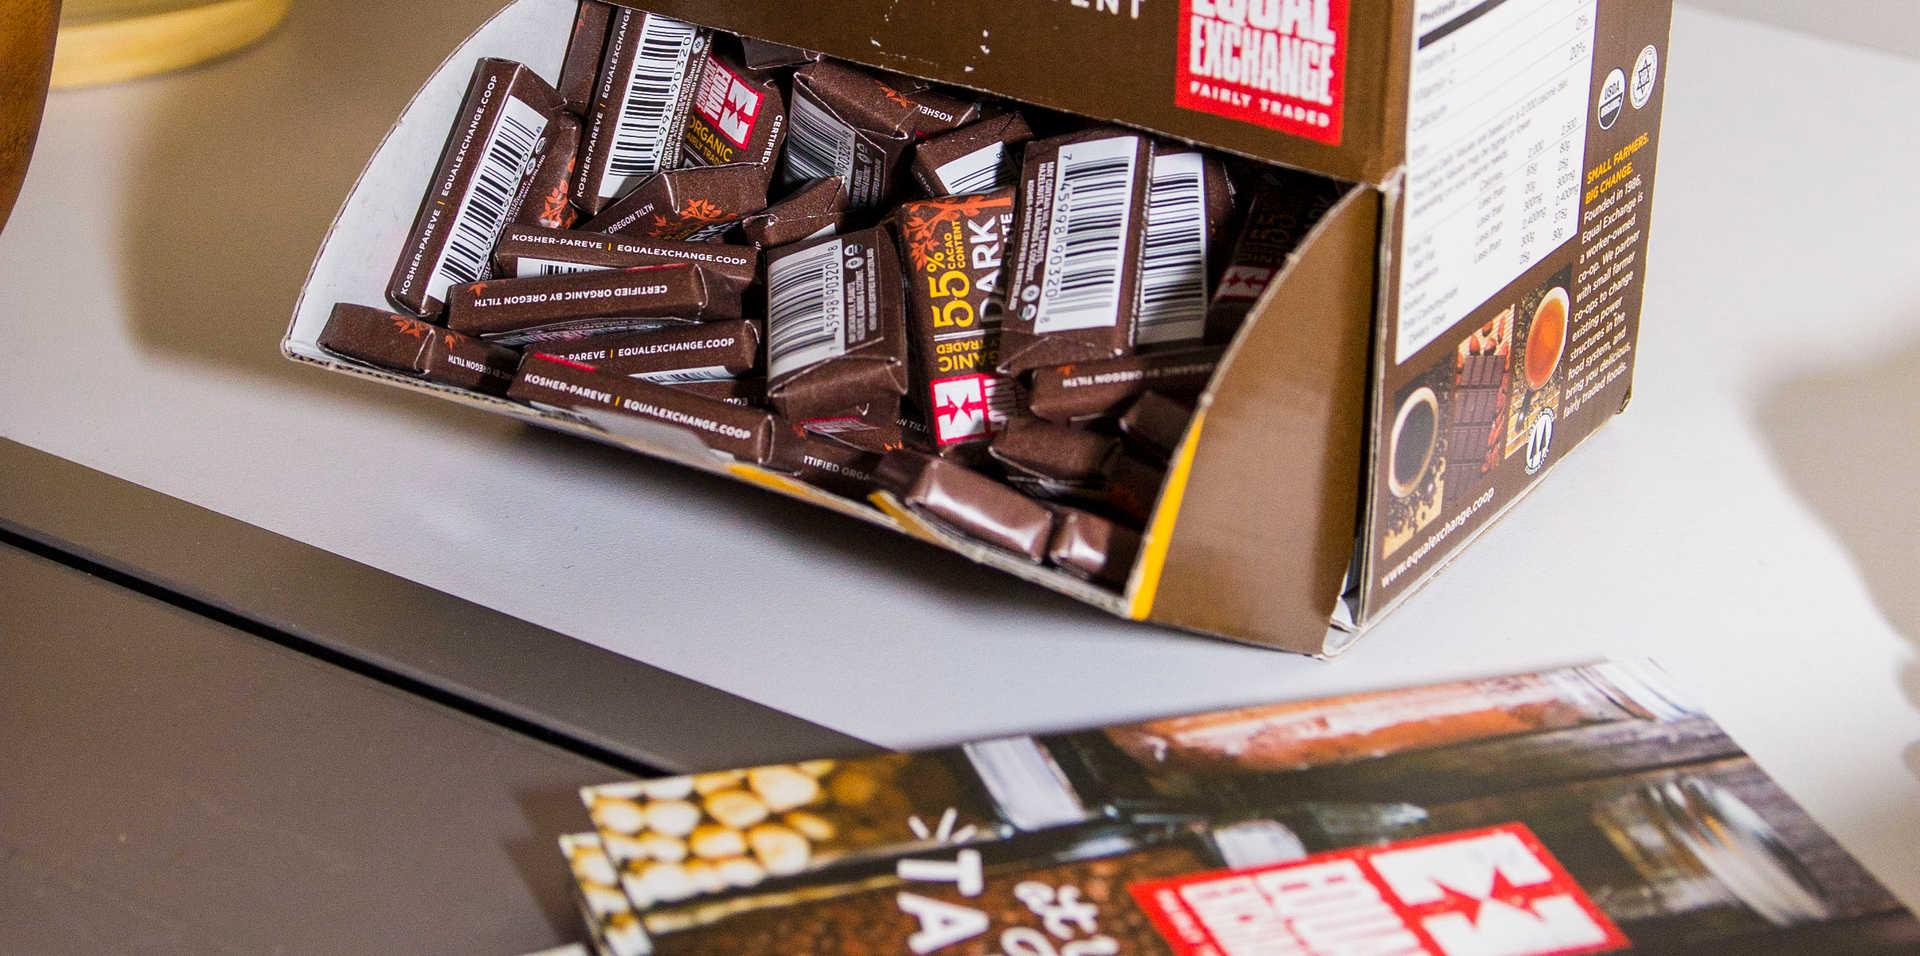 Equal Exchange Chocolate